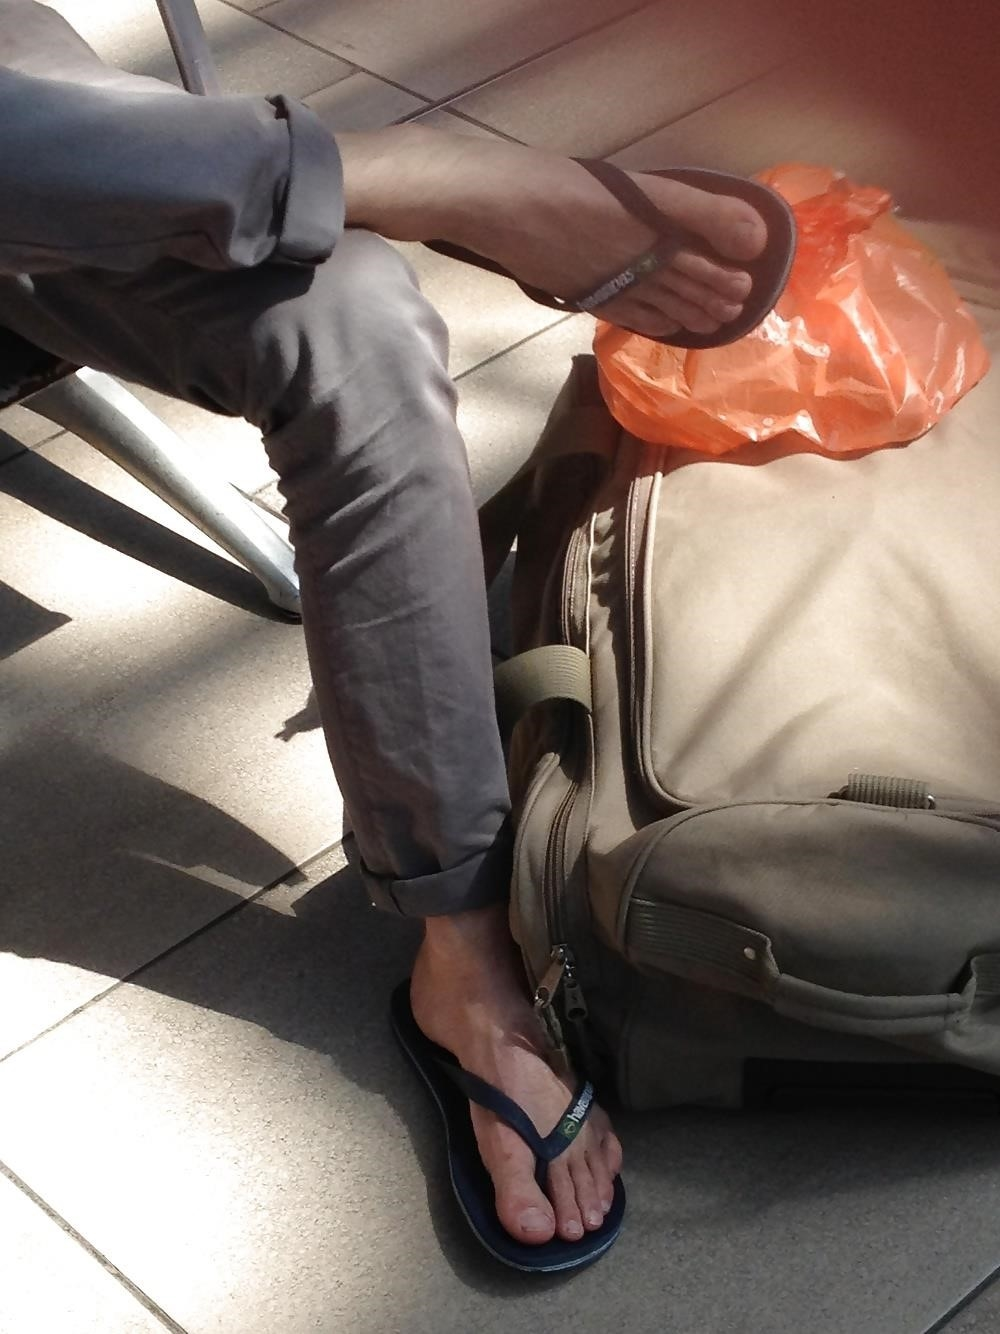 Gay feet hairy-6004